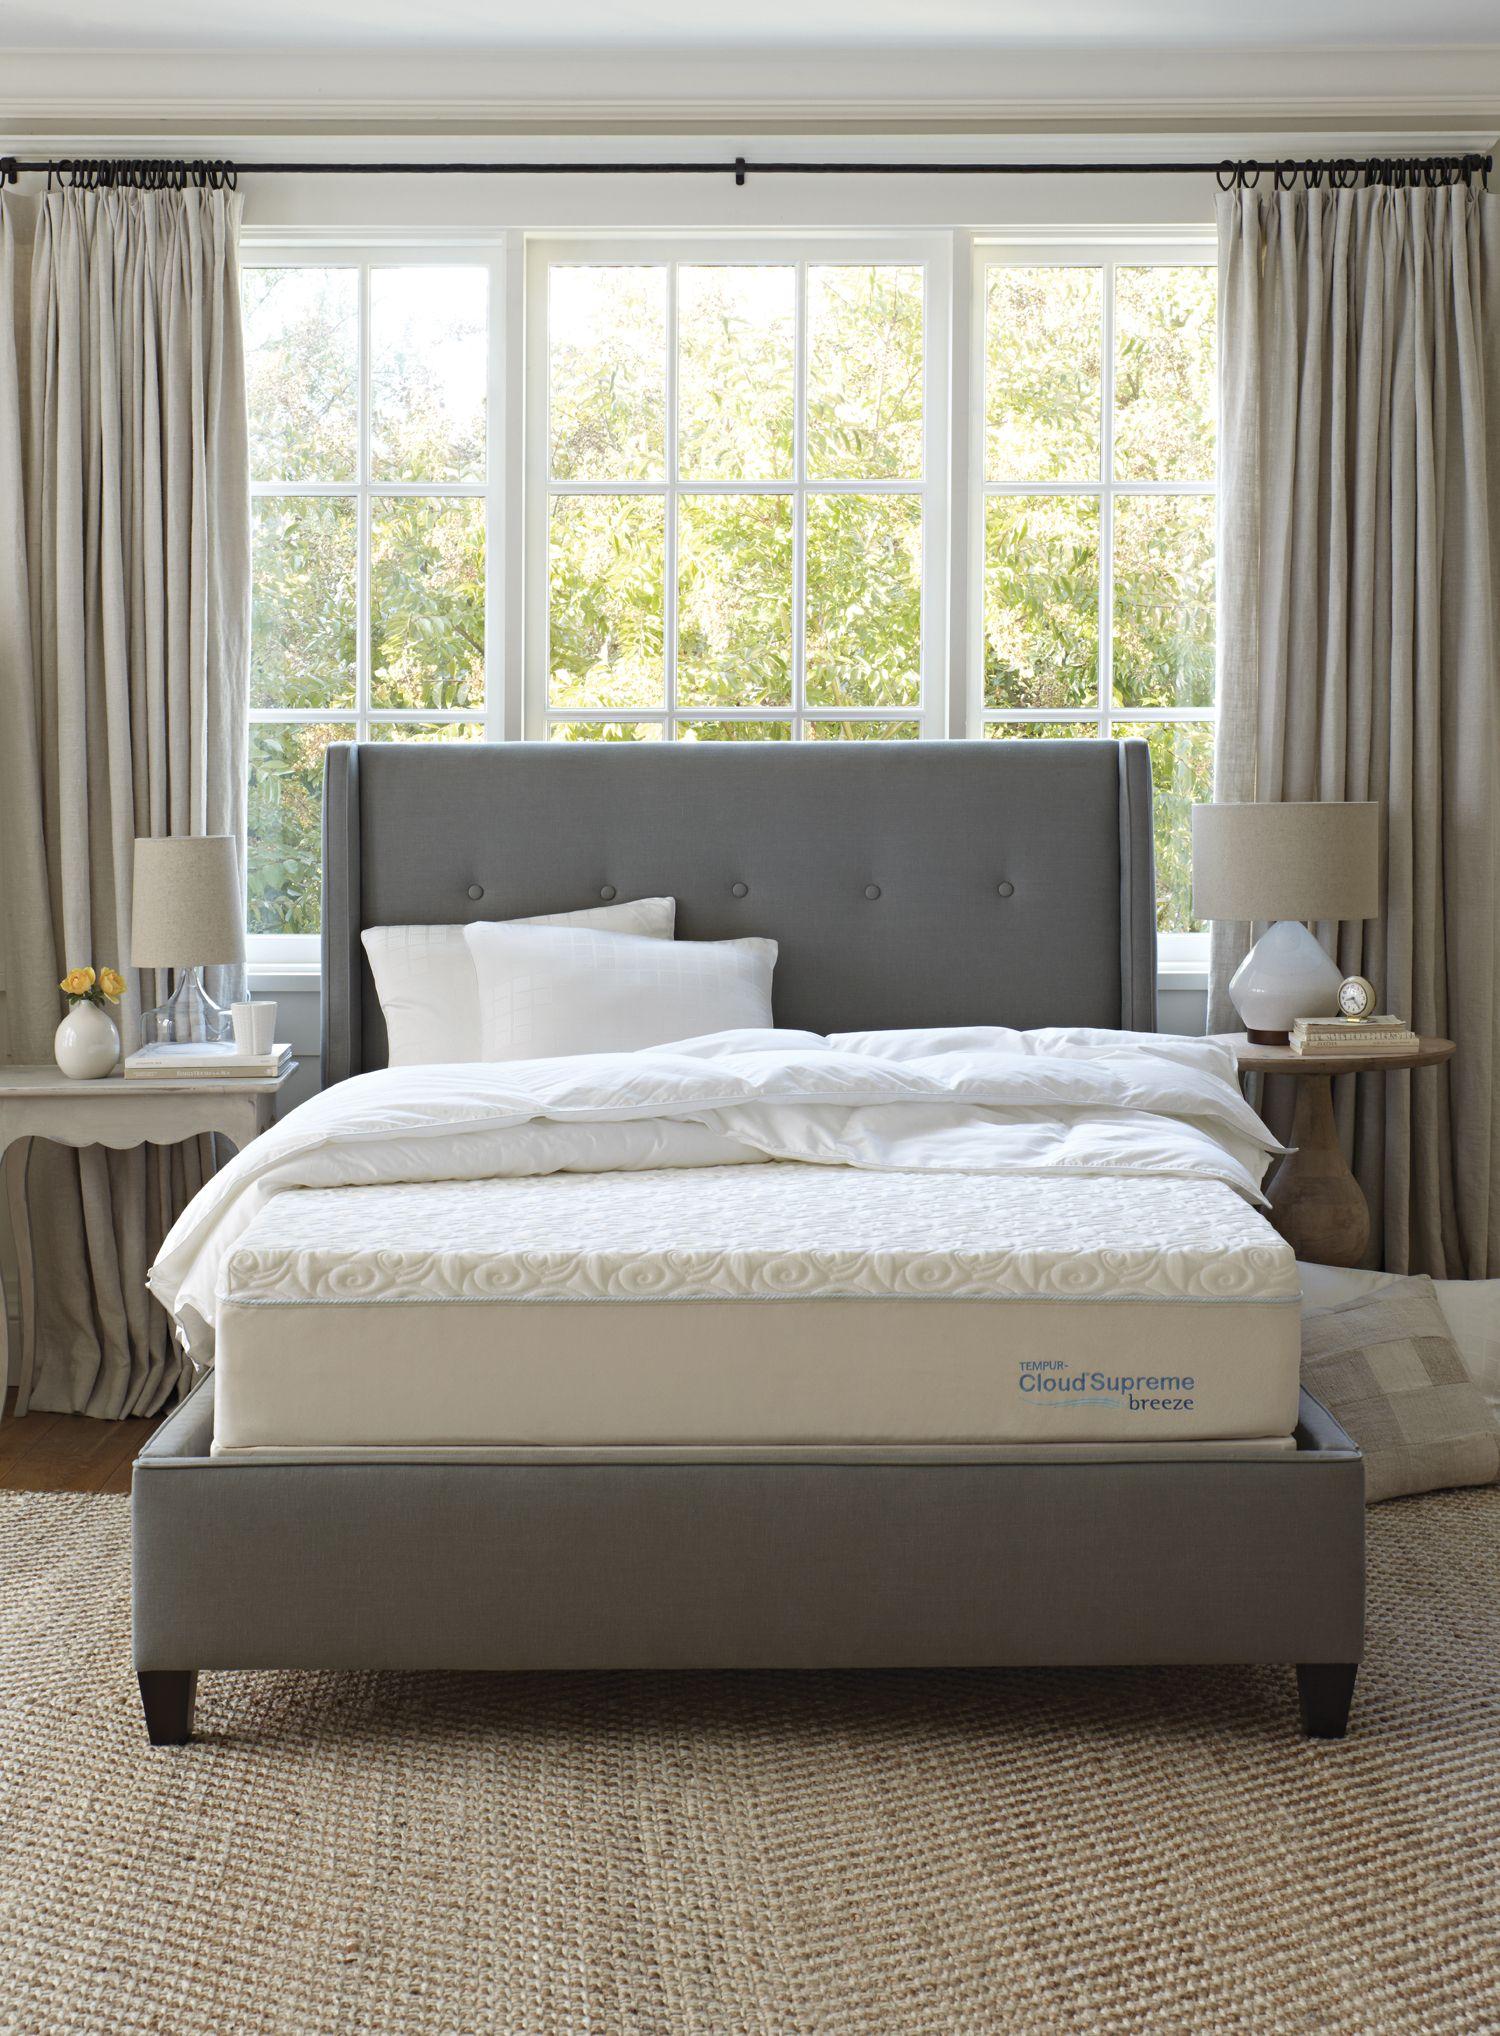 3 master bedroom apartments  The Cloud Supreme Breeze tempurpedic temperpedic heavenly king